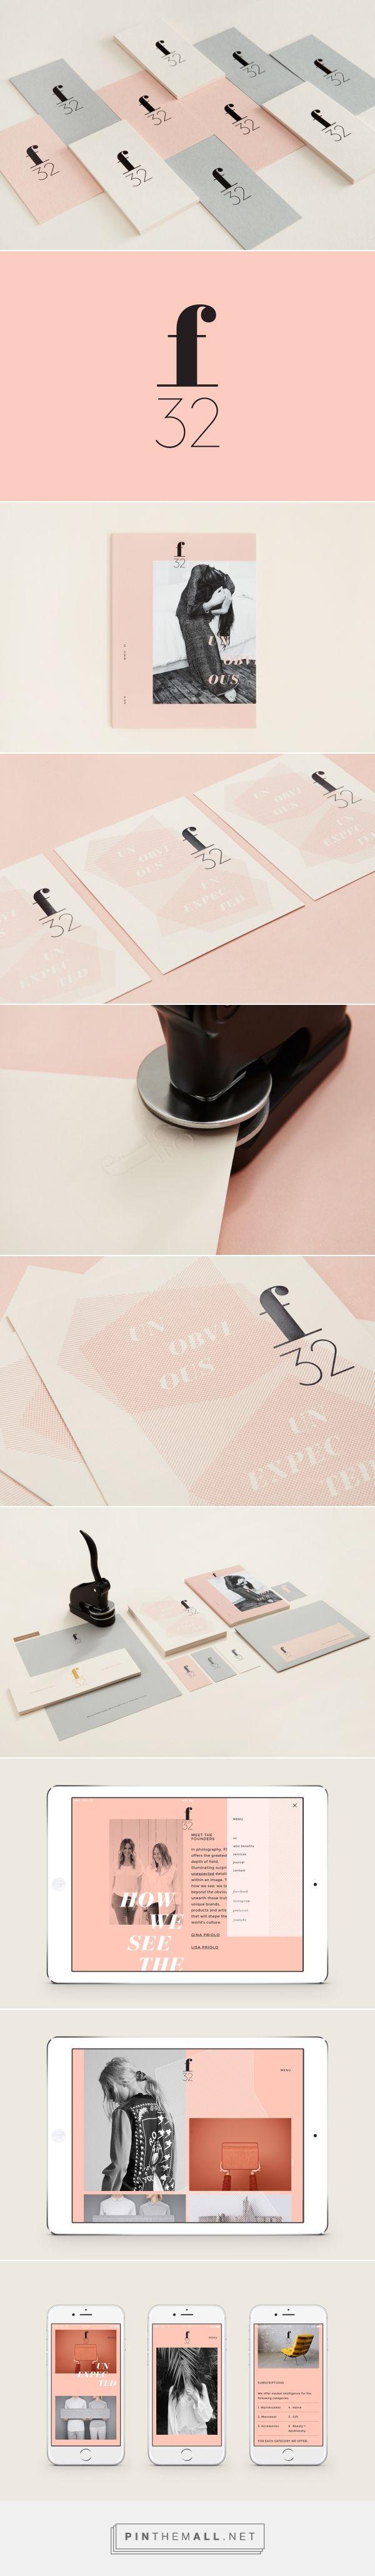 New Logo & Brand Identity for f32 by Blok Design